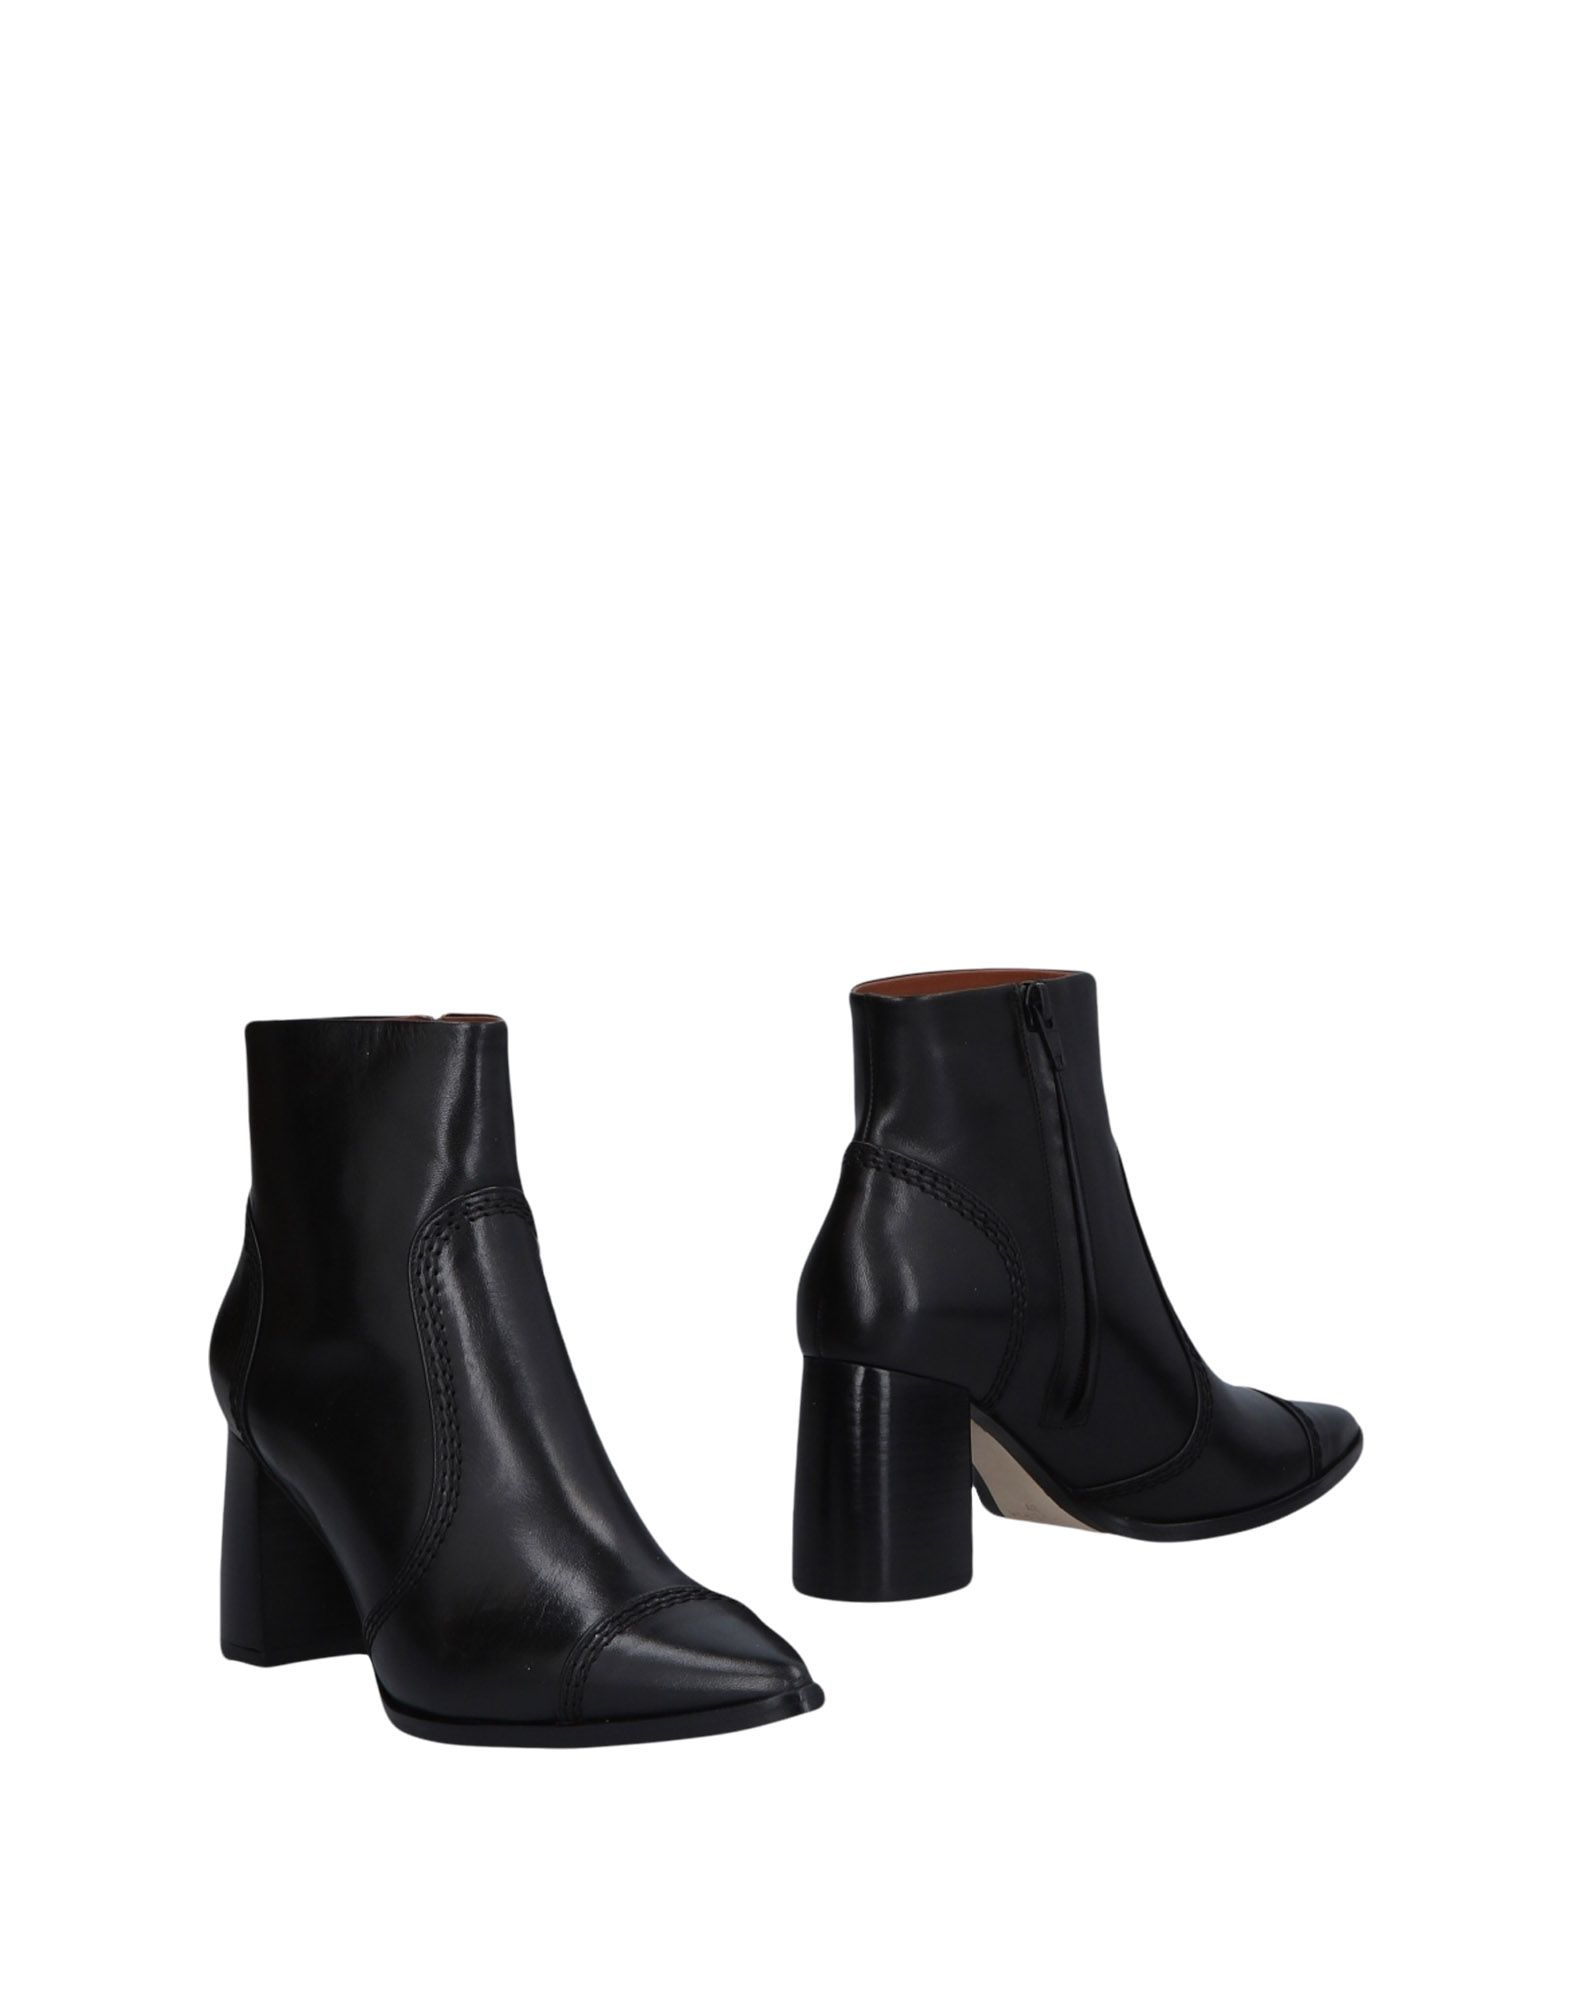 Joseph Joseph Ankle Boot - Women Joseph Joseph Ankle Boots online on  Canada - 11481063UK 9b1f02